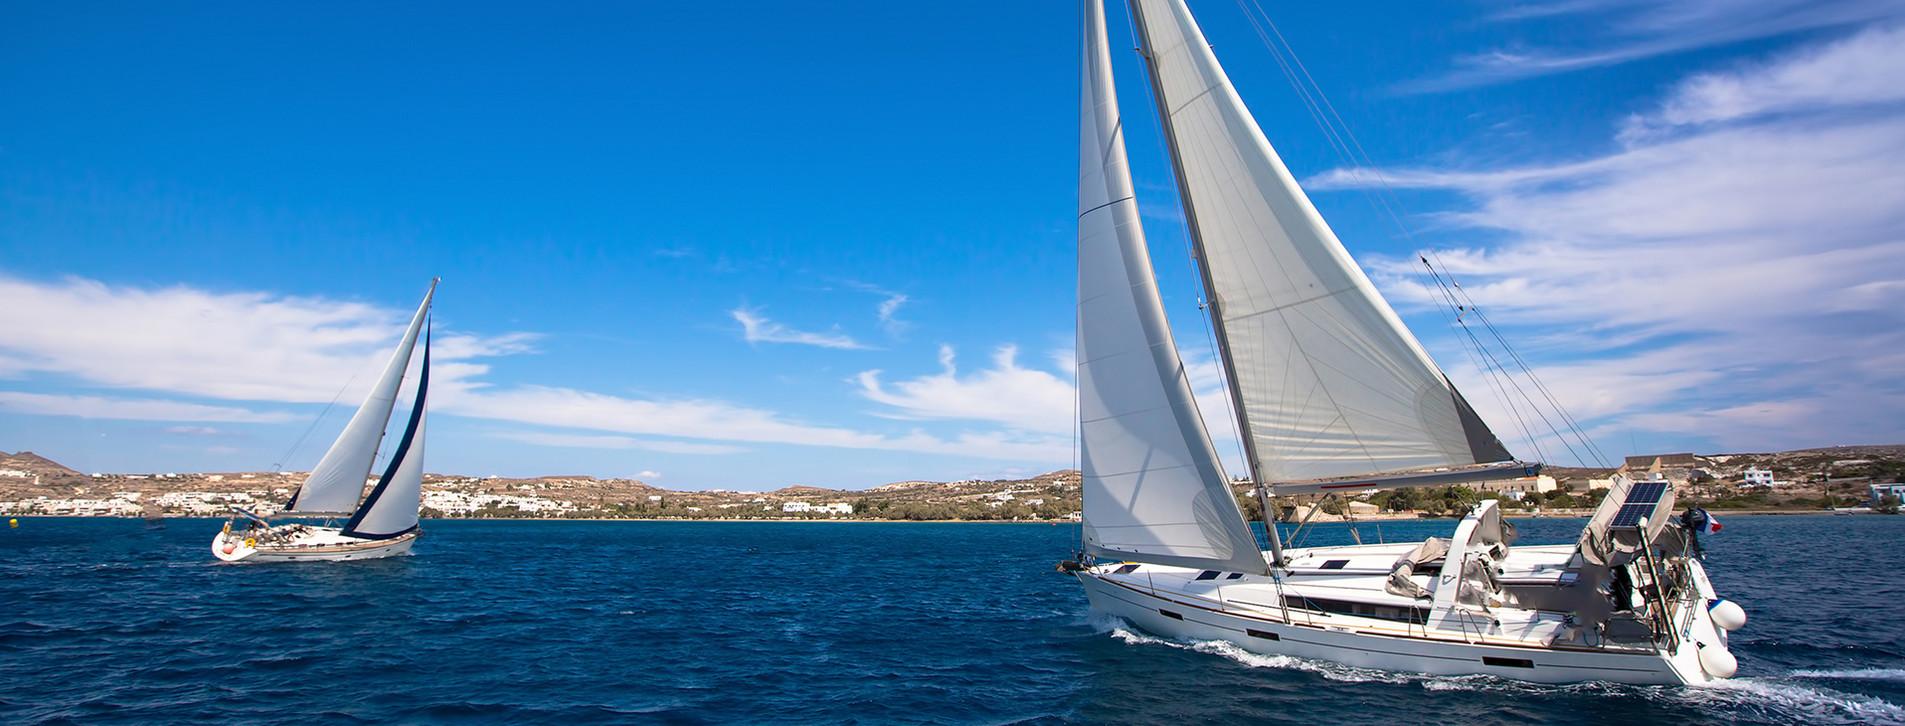 Фото 1 - Академия яхтинга Fleet 5 с практикой за границей